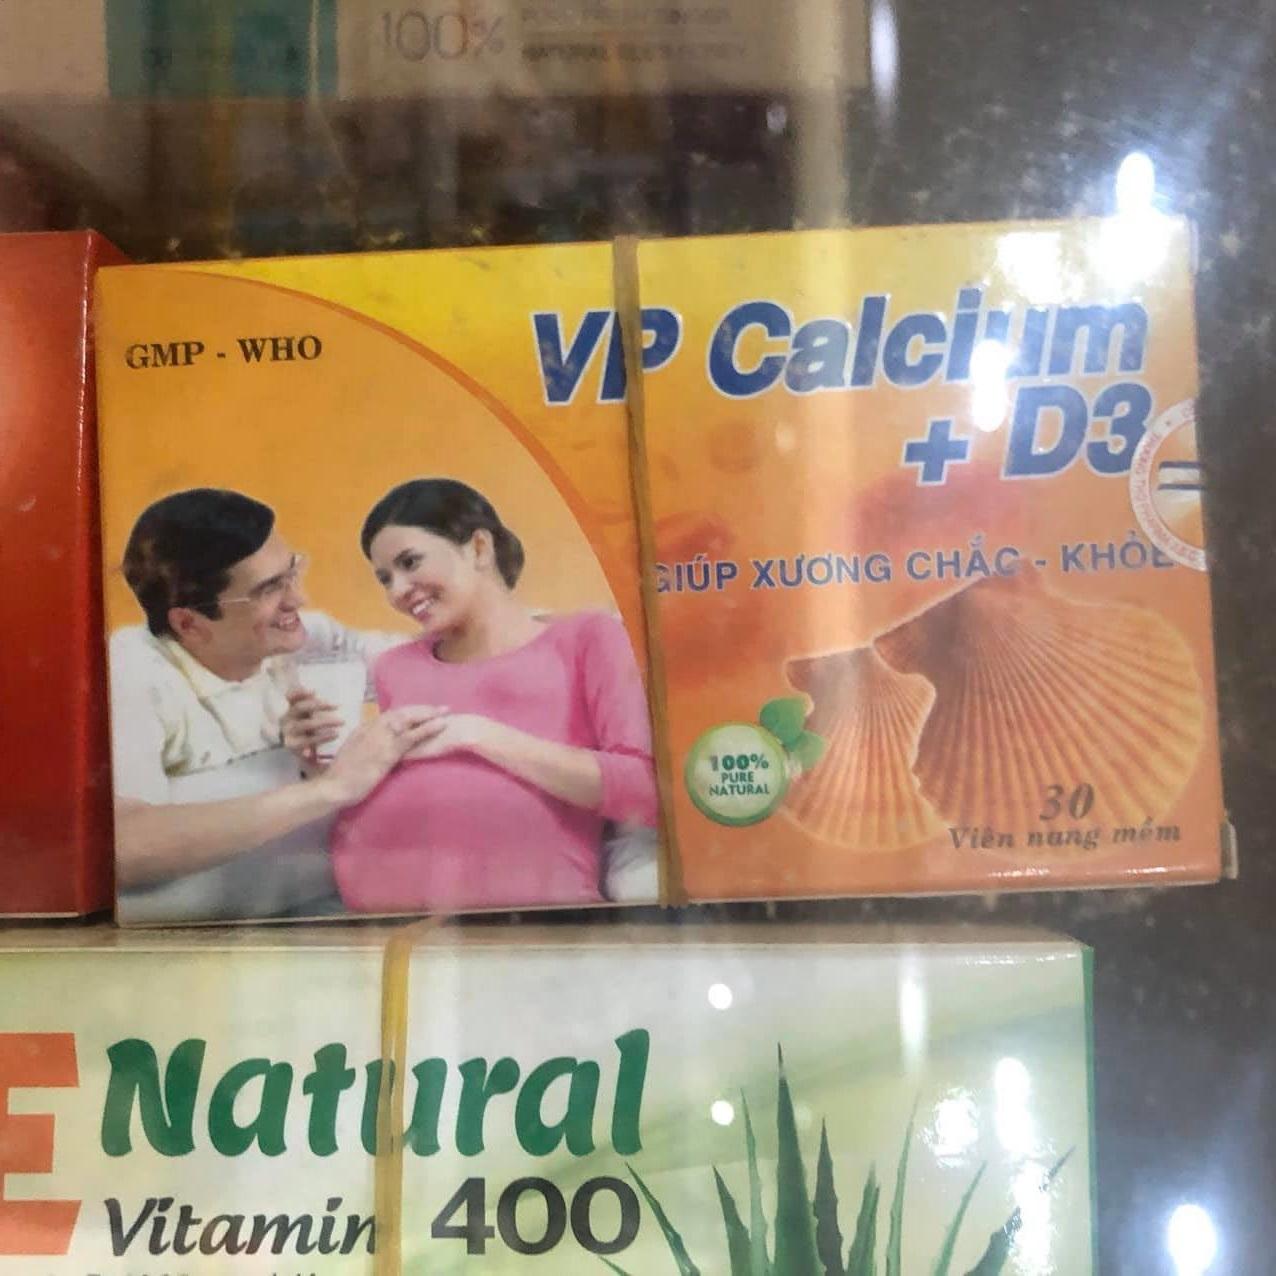 Vp Calcium + D3 30 viên